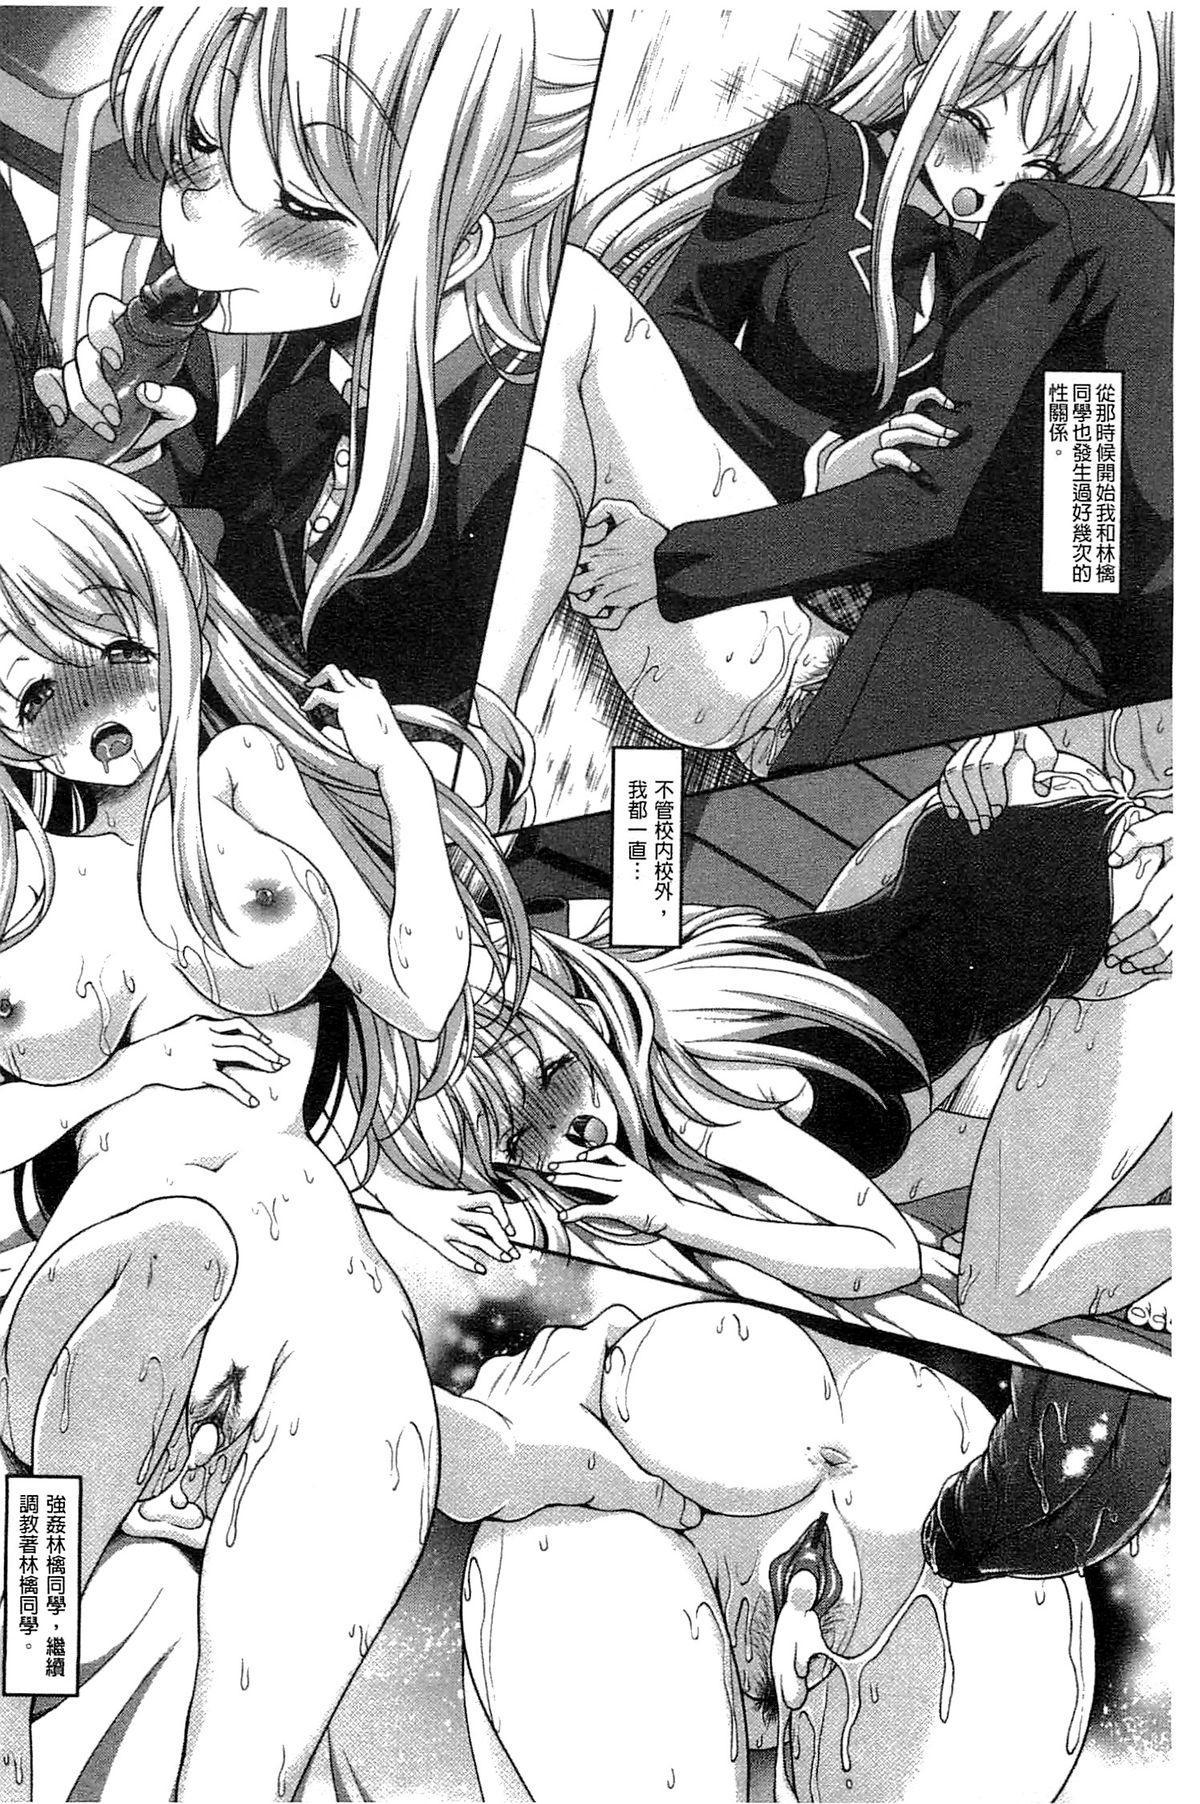 Hajimete nan da kara 33